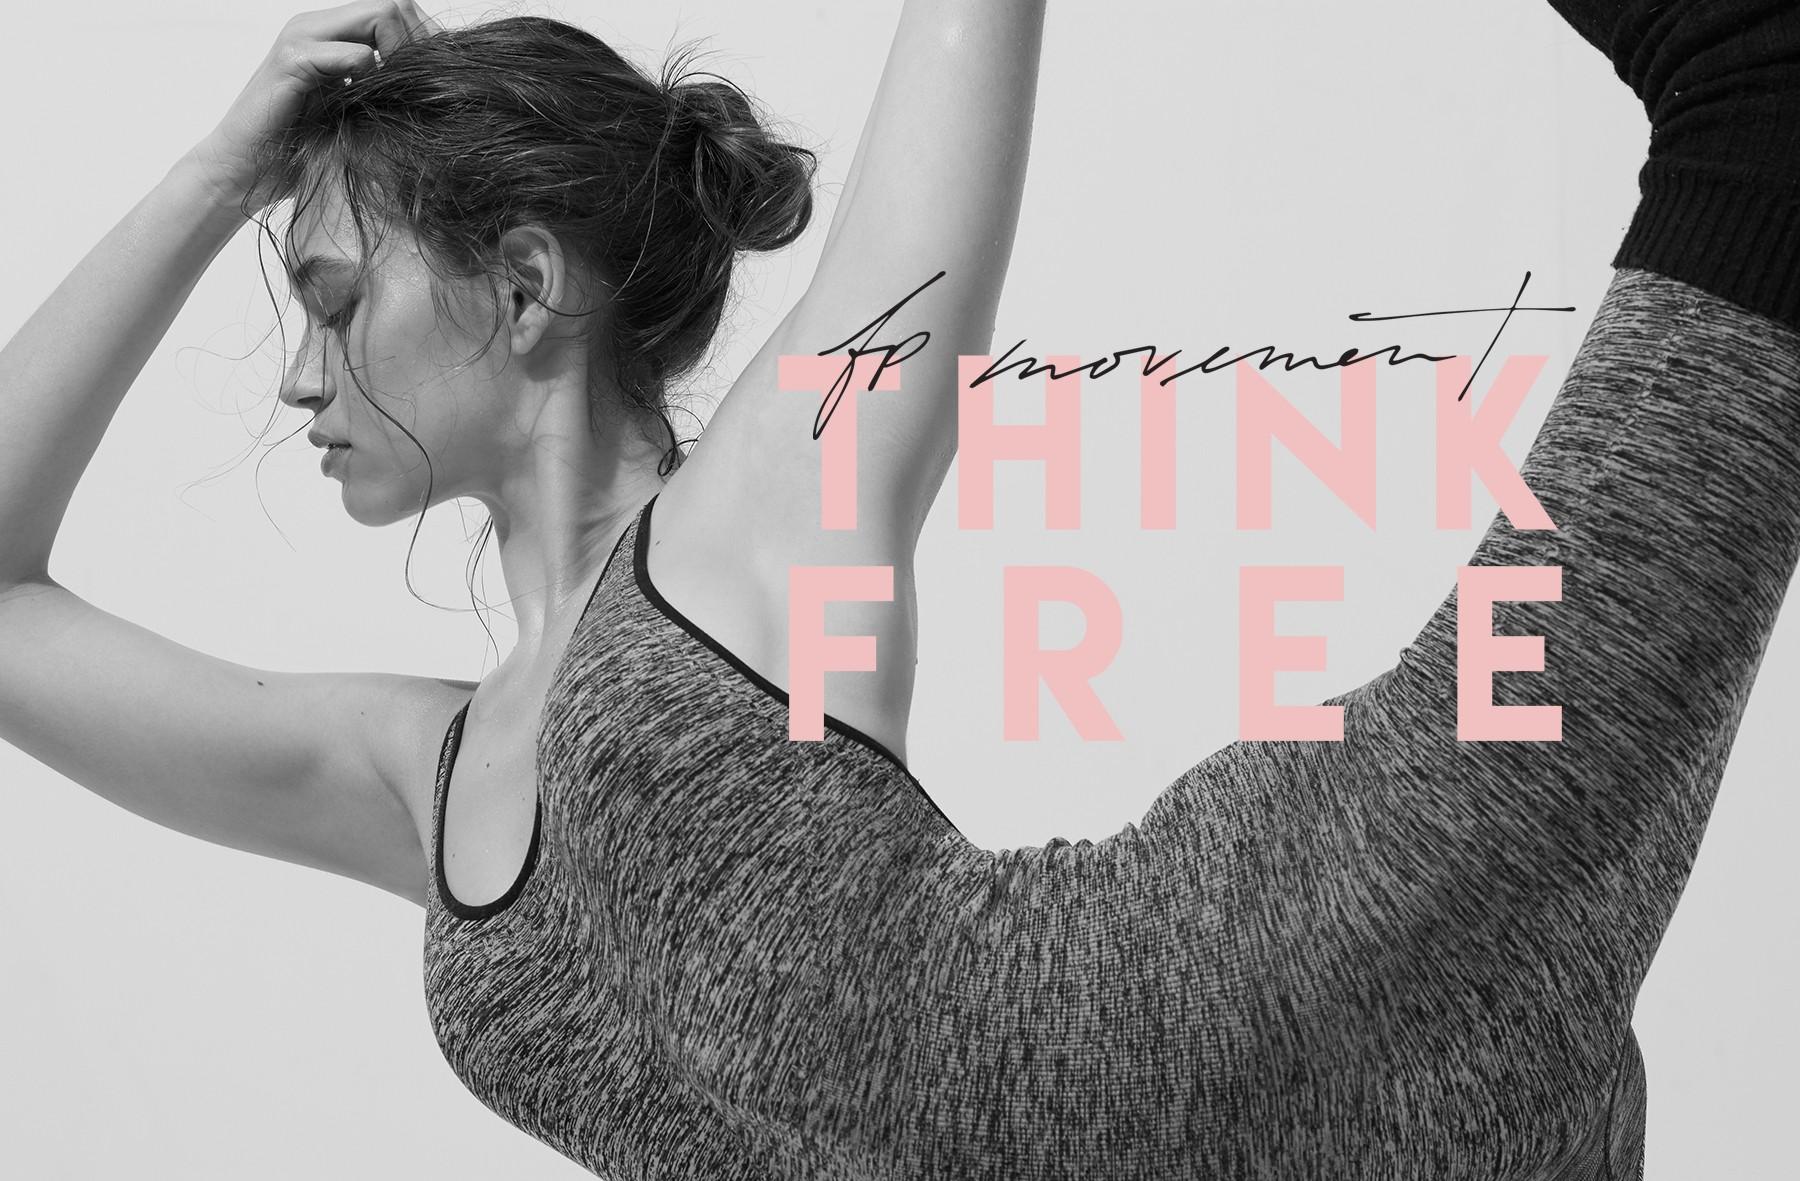 Shop FP Movement: Think Free